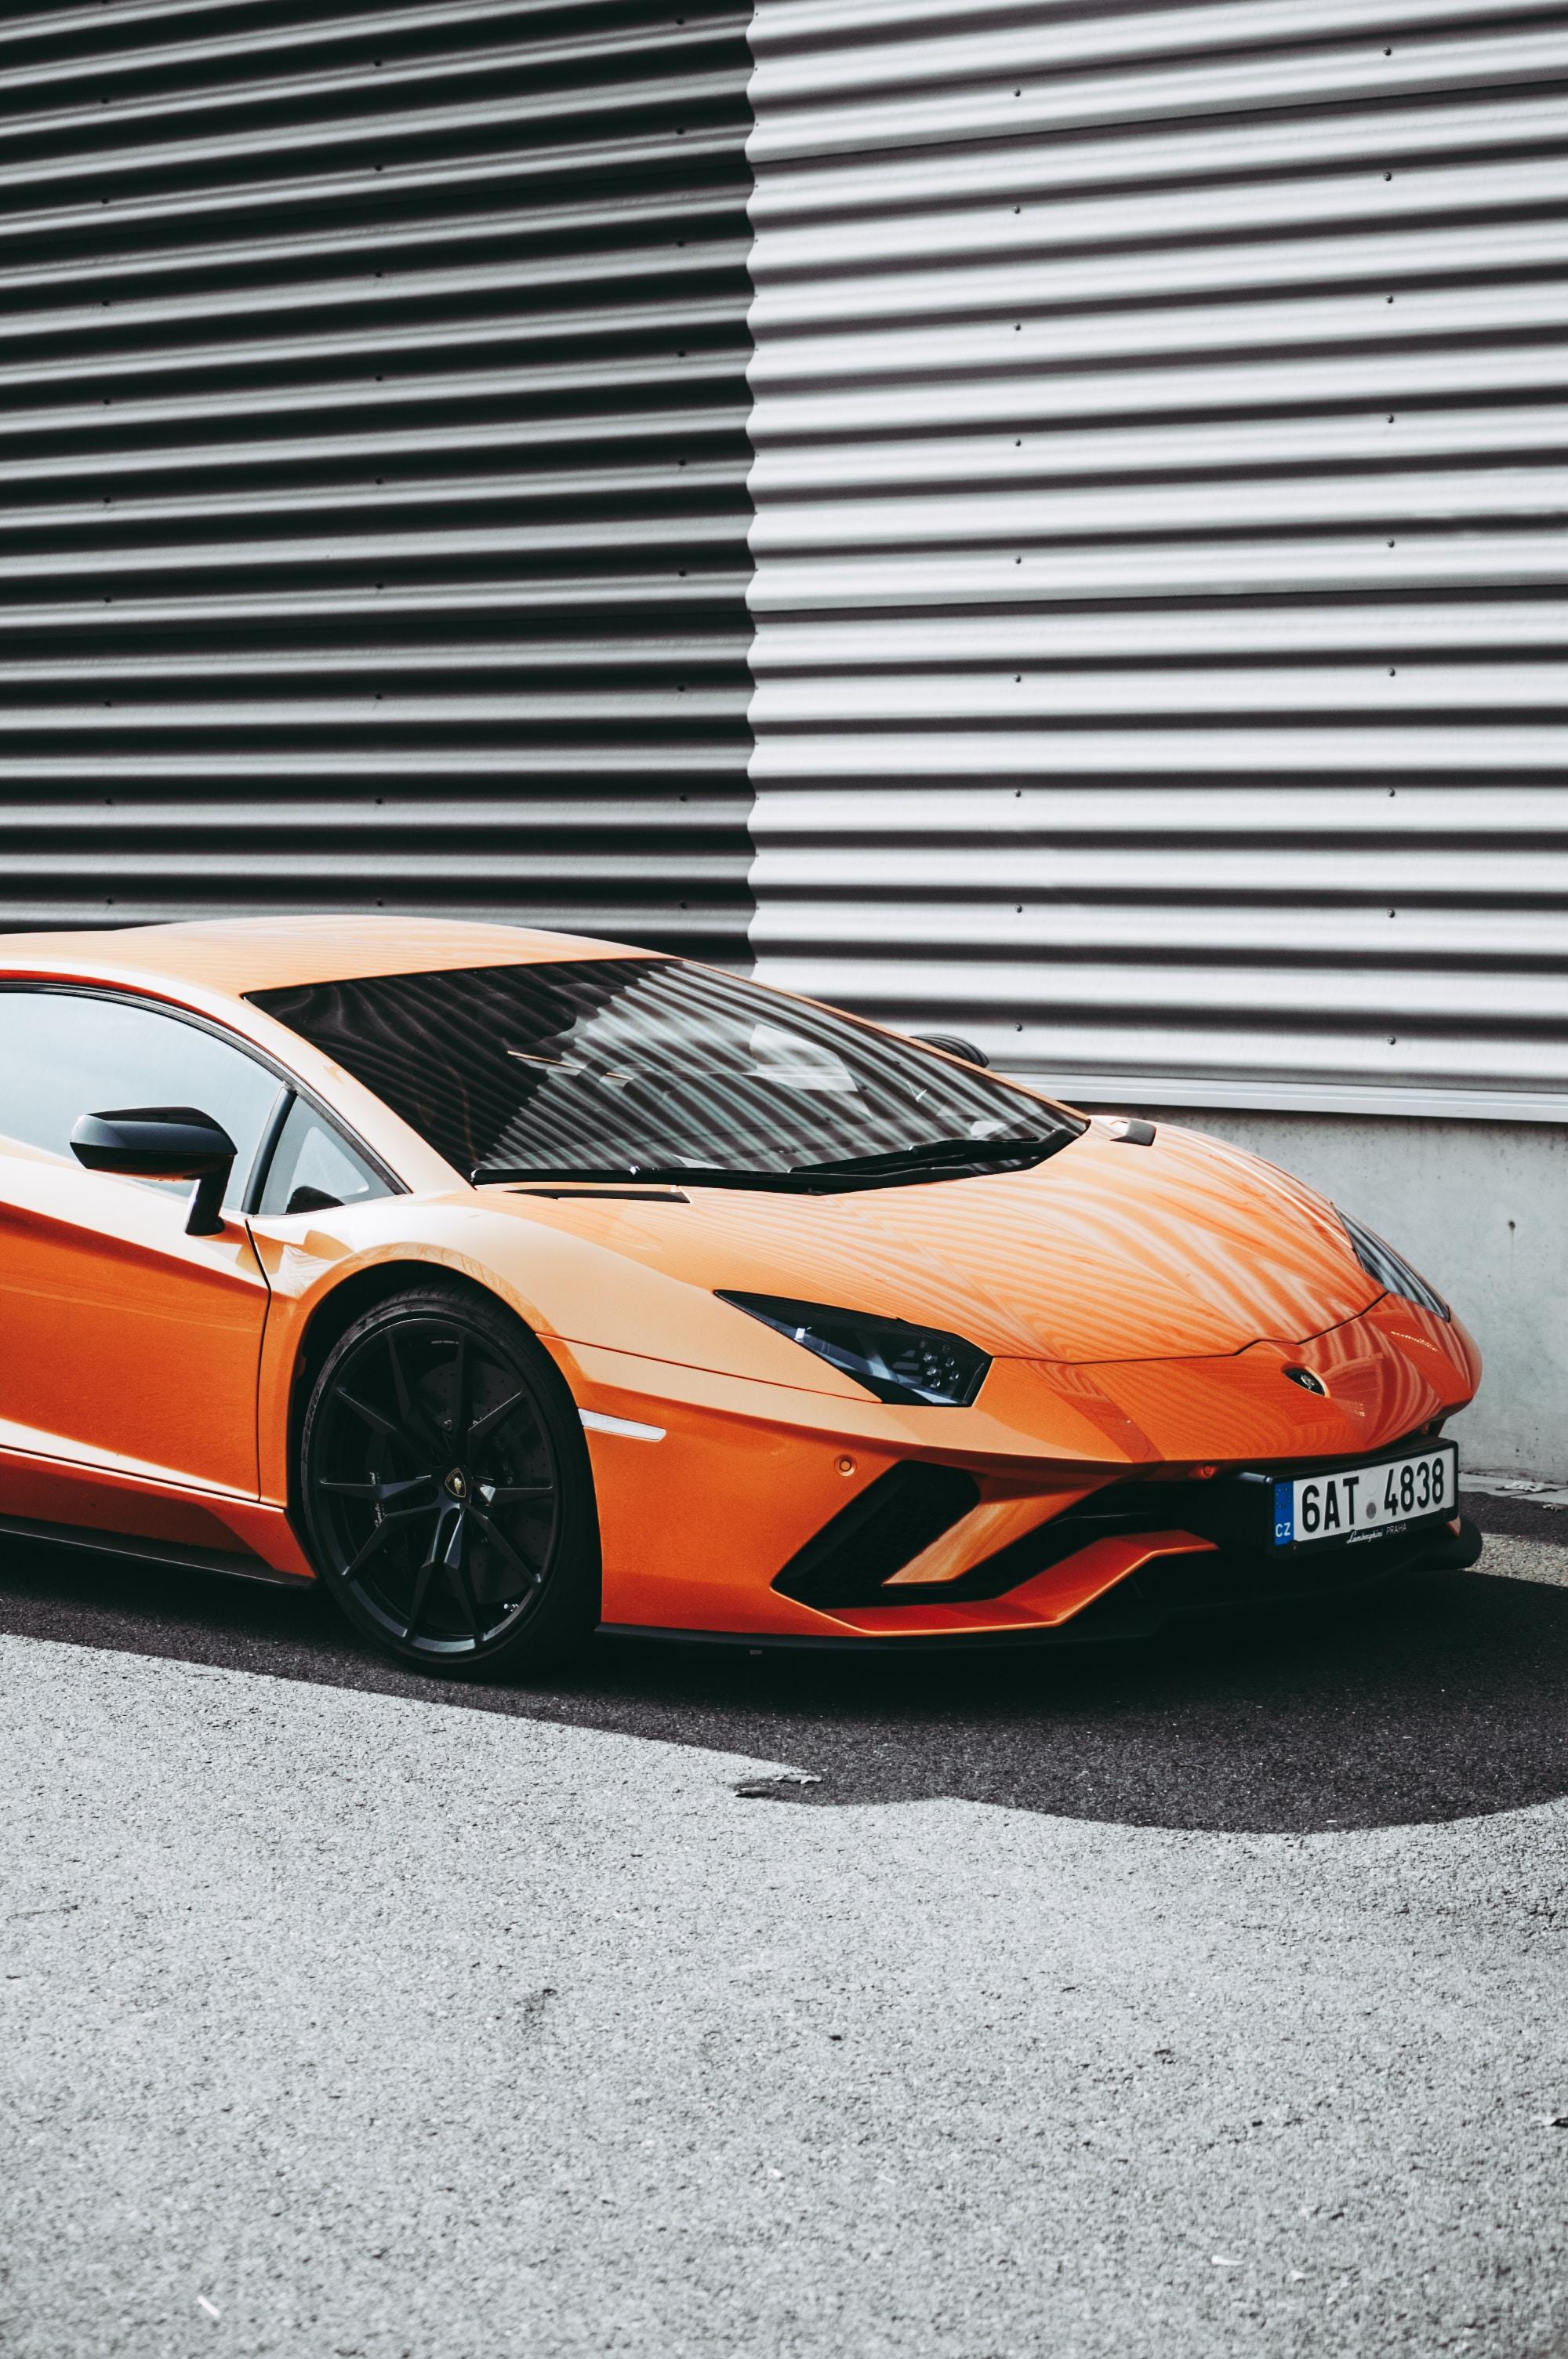 orange Lamborghini sports coupe parked near corrugated wall at daytime